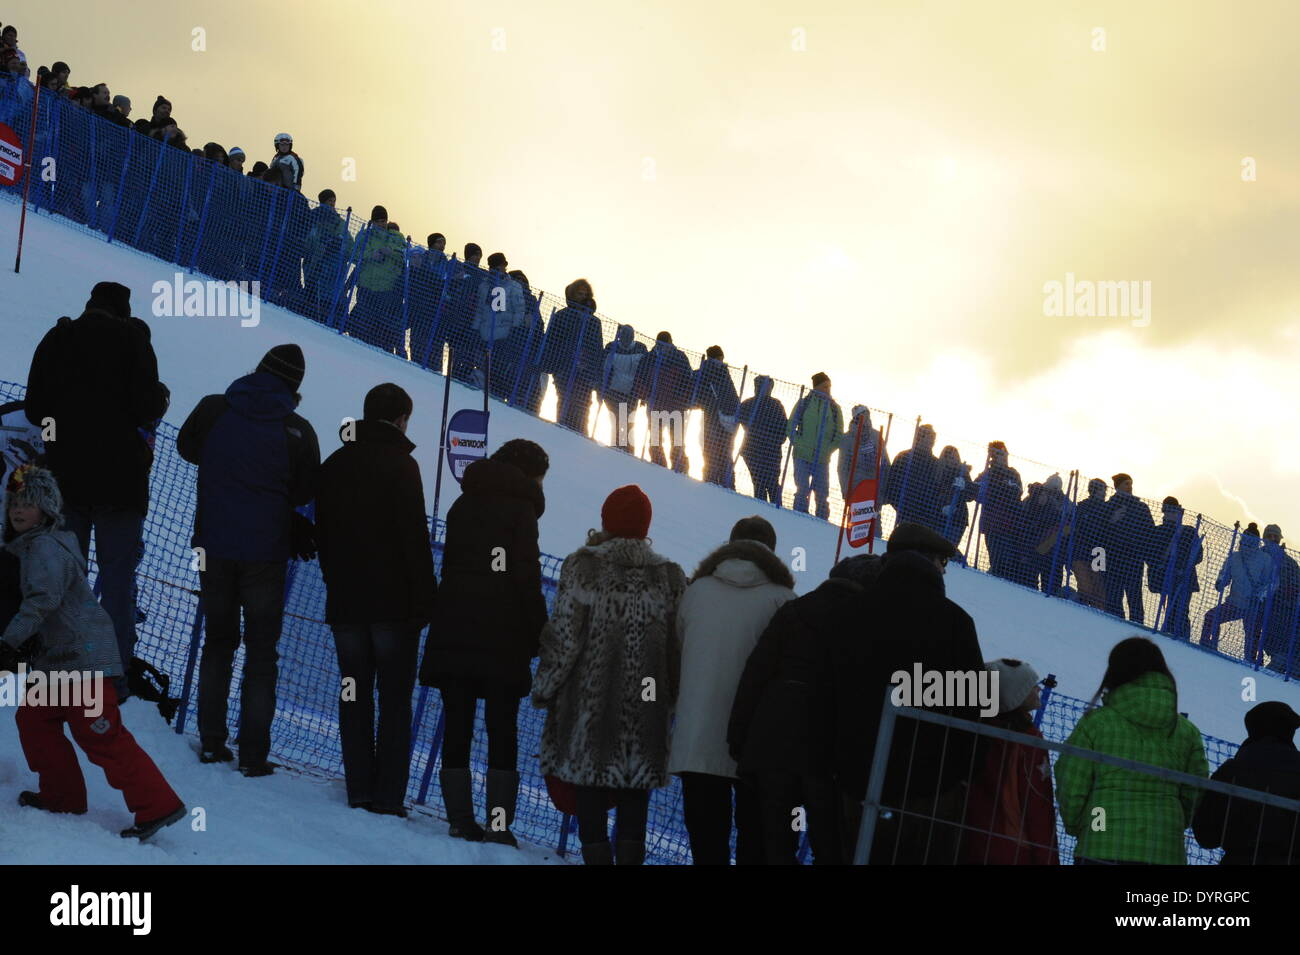 The FIS Alpine Ski World Cup, 2011 Stock Photo